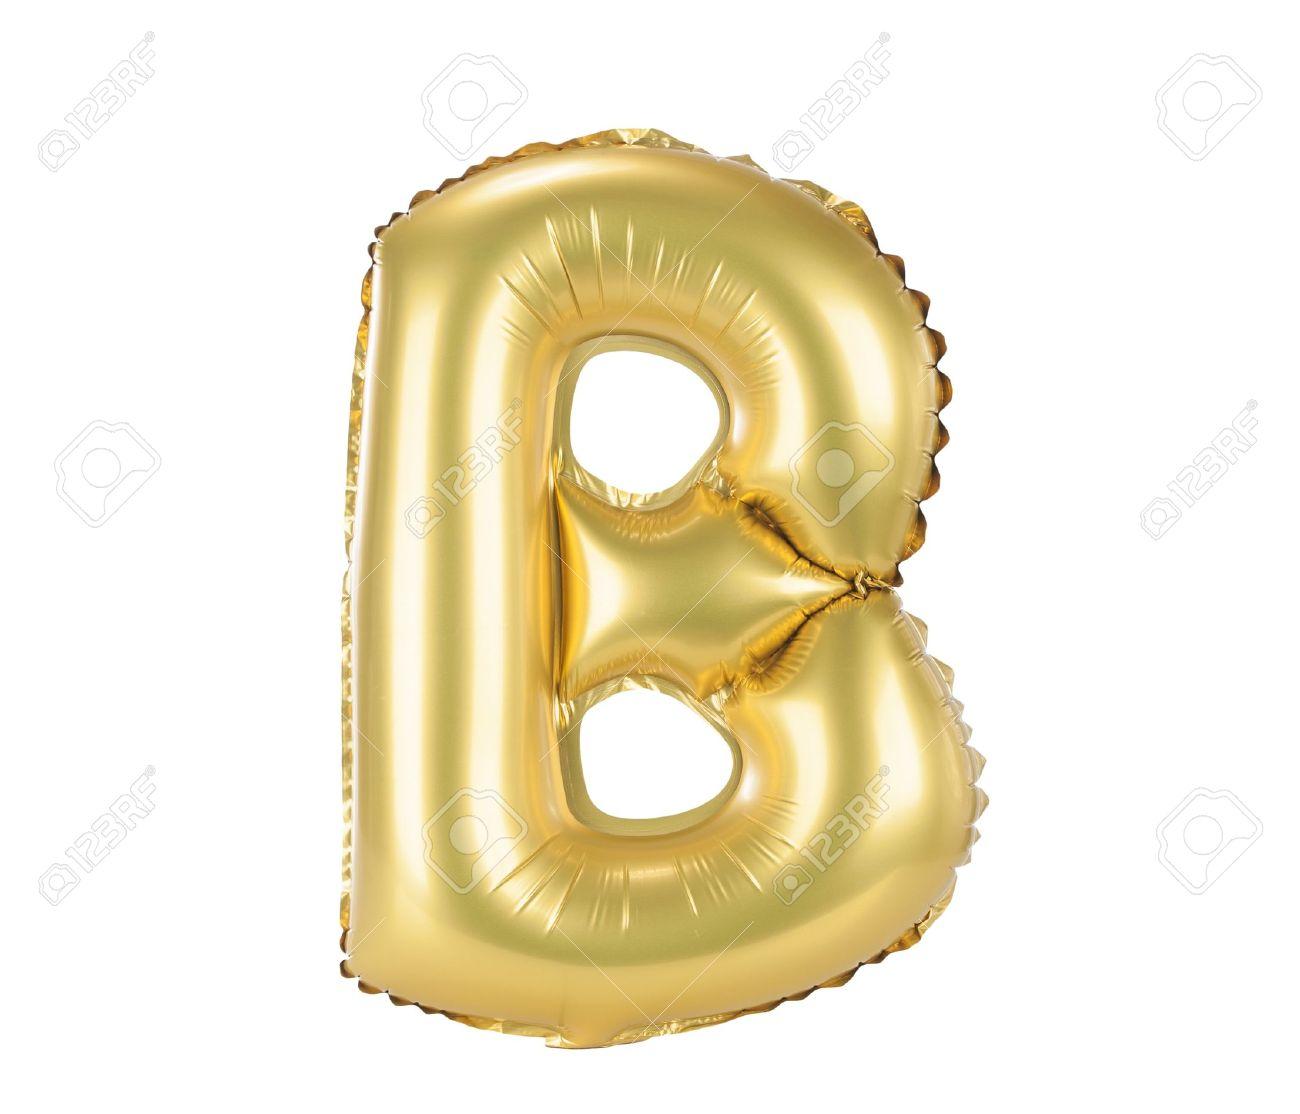 balloon letter font - Fashion.stellaconstance.co